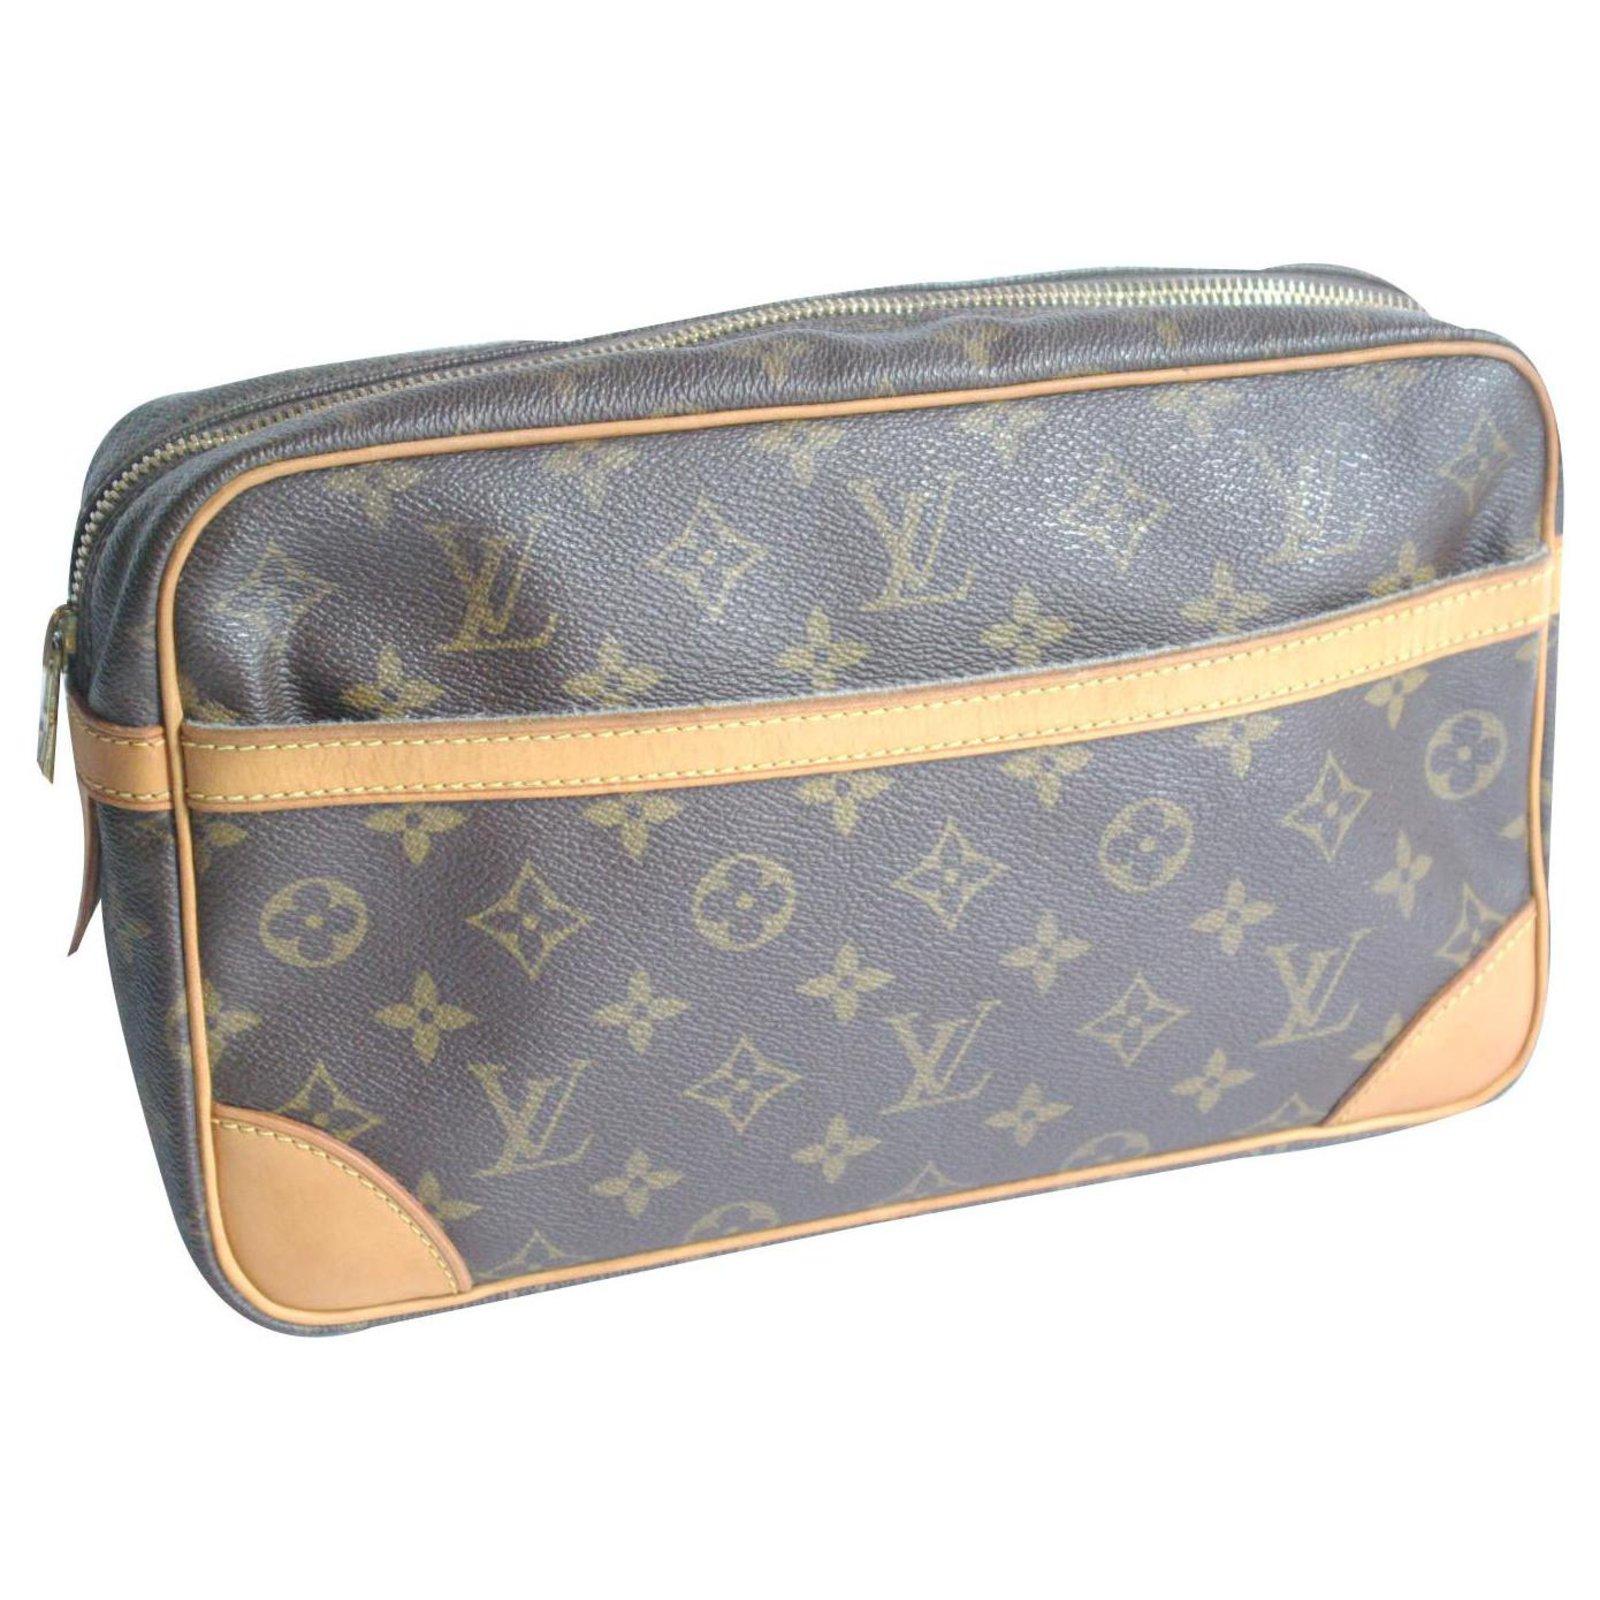 2bc3776b1 Louis Vuitton Compiègne 28 Clutch bags Leather,Cloth Brown ref.131431